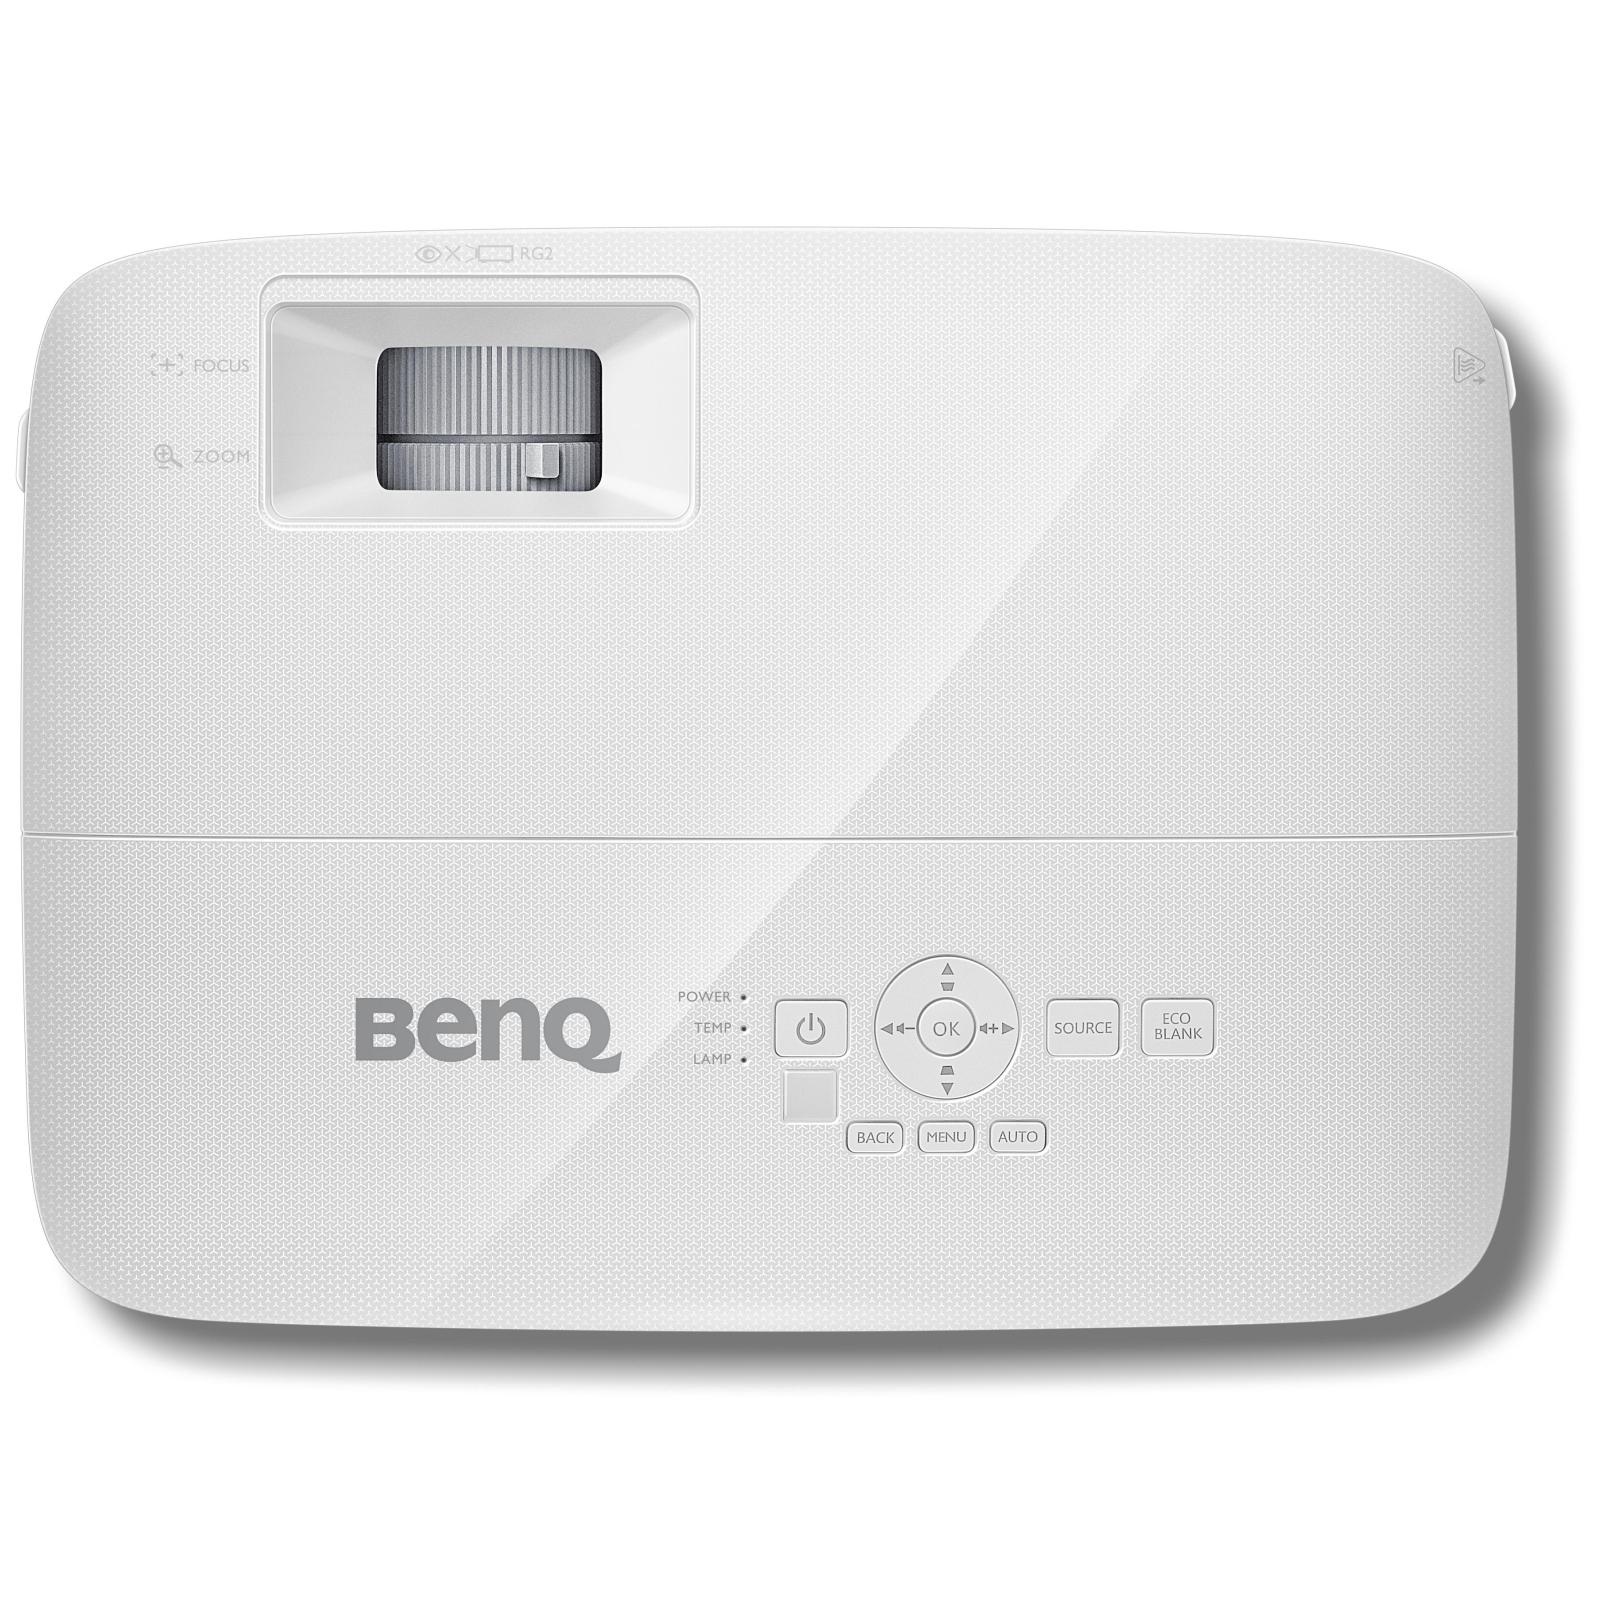 Проектор BenQ MW550 (9H.JHT77.13E) изображение 6